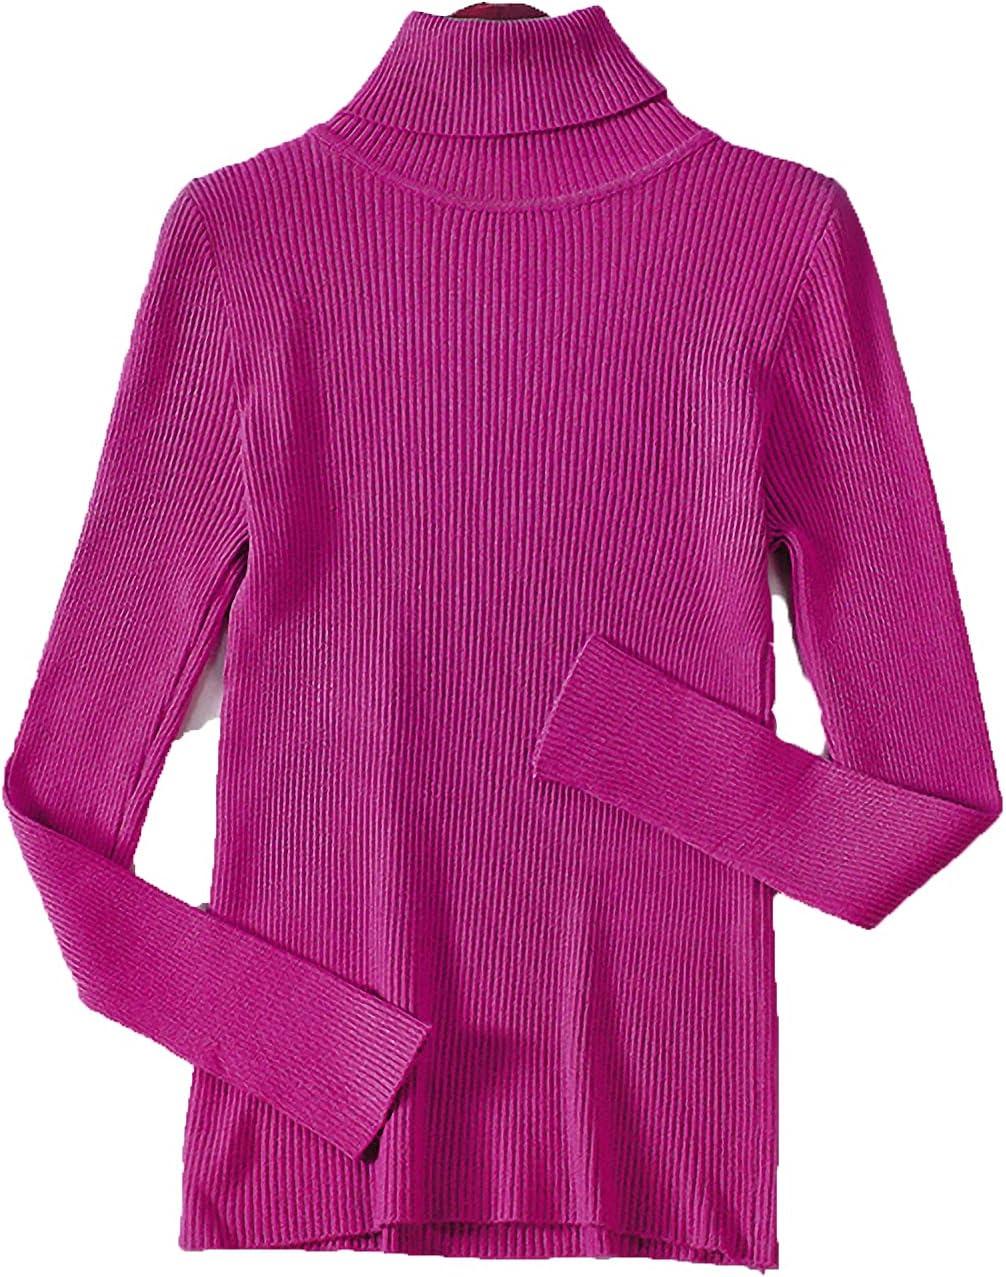 Basic Turtleneck Women Sweaters Autumn Winter Tops Slim Women Pullover Knitted Sweater Jumper Soft Warm Pull